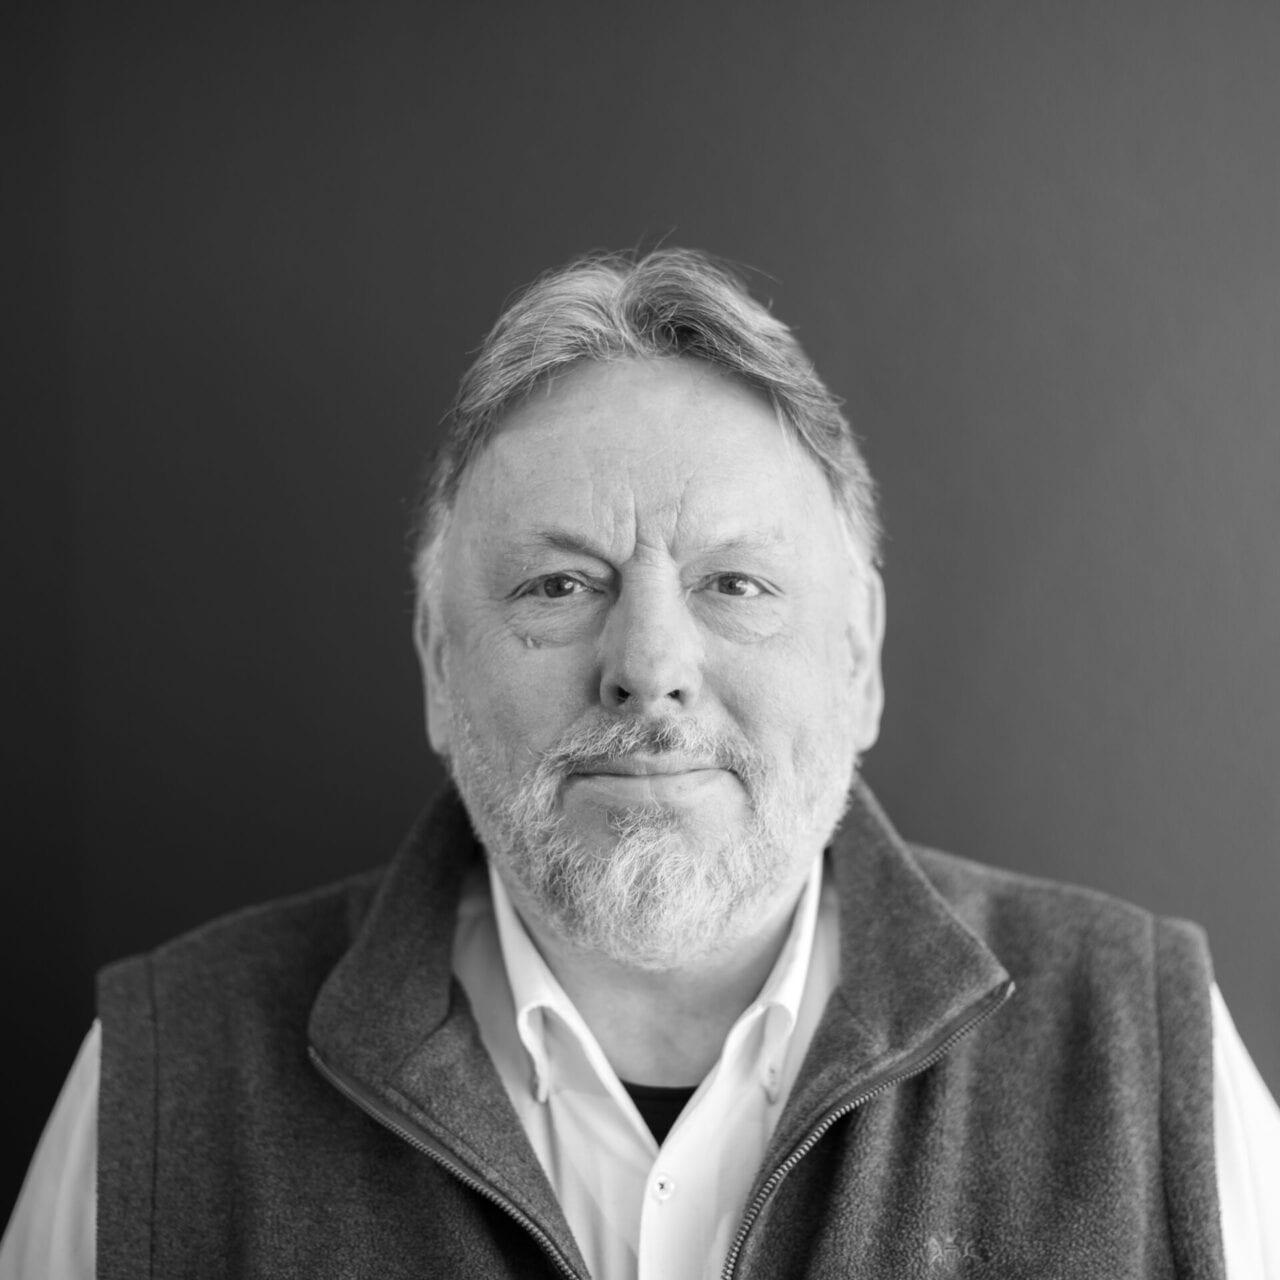 Gerhard Kohn